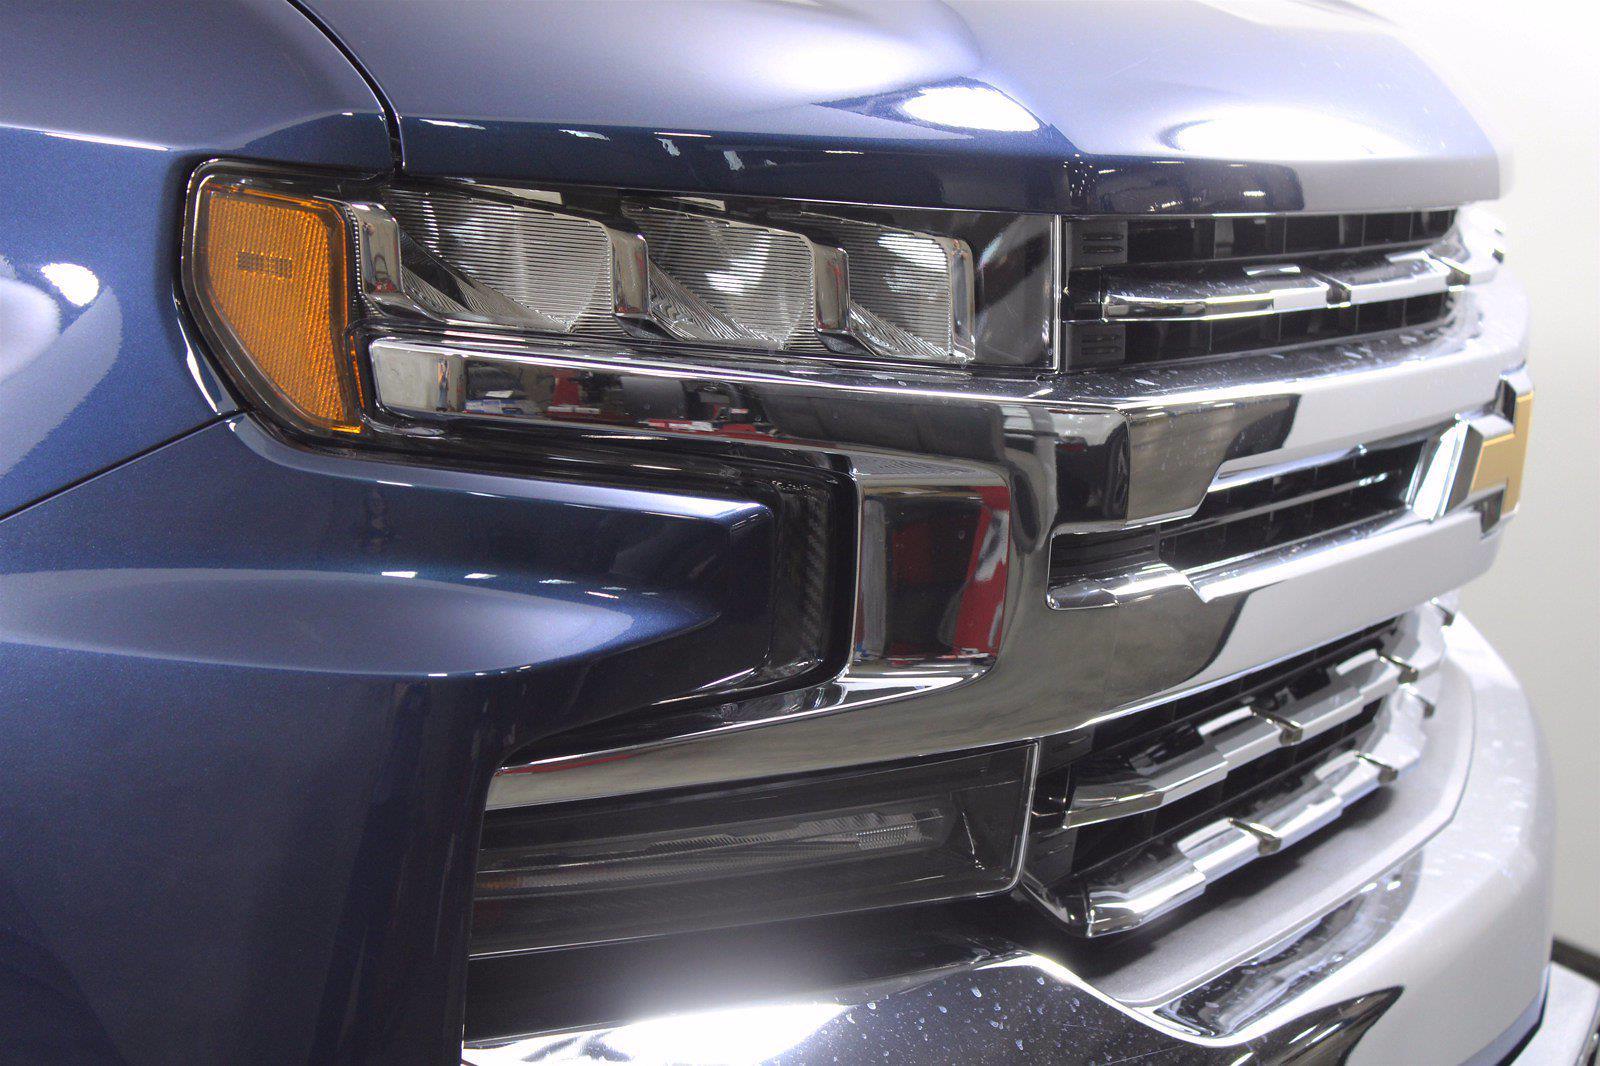 2021 Chevrolet Silverado 1500 Crew Cab 4x4, Pickup #D111155 - photo 5